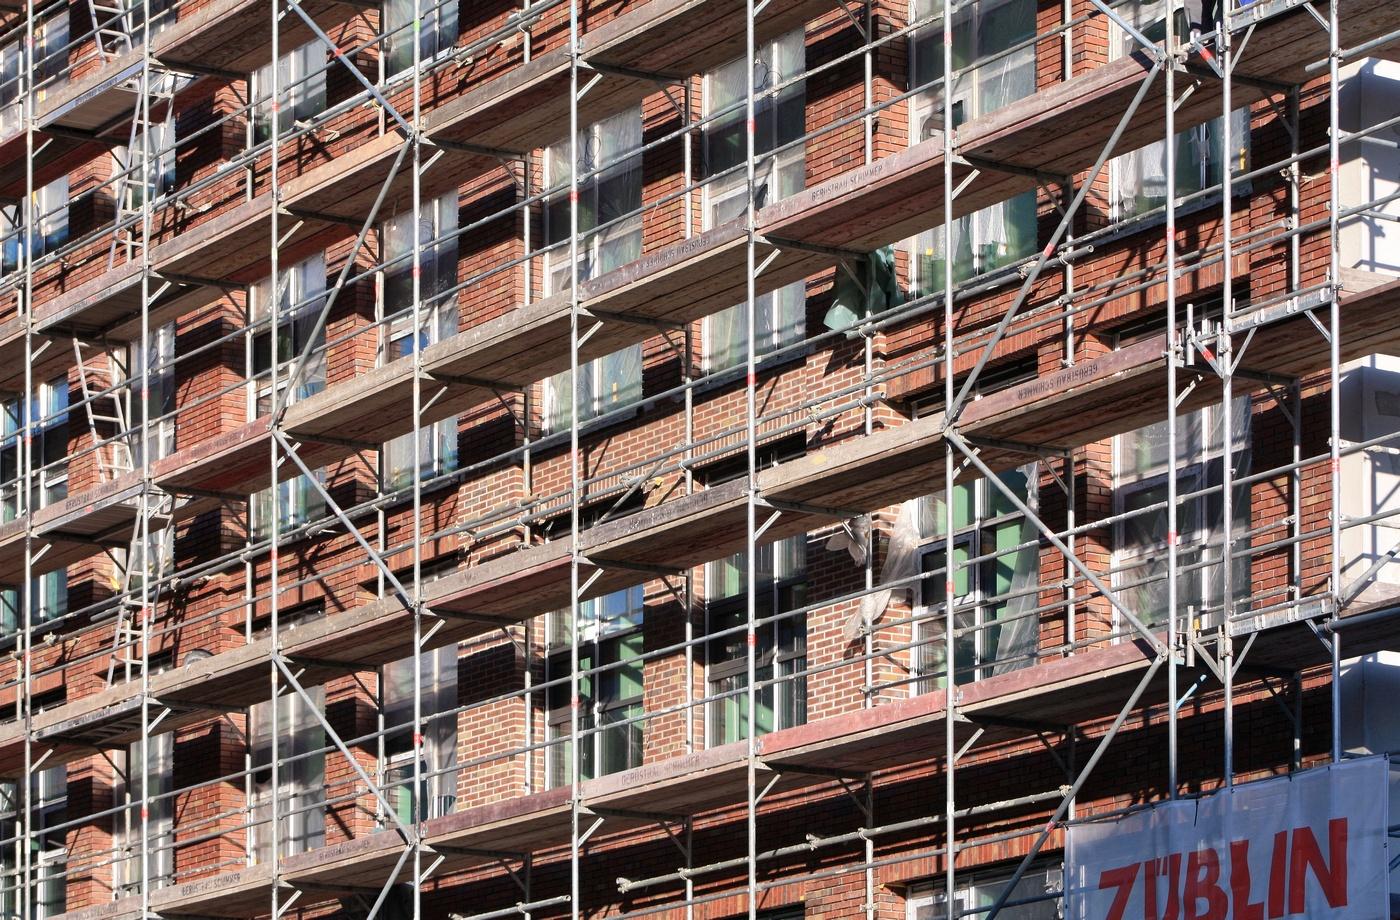 4196_db-brick_db-tower.jpg